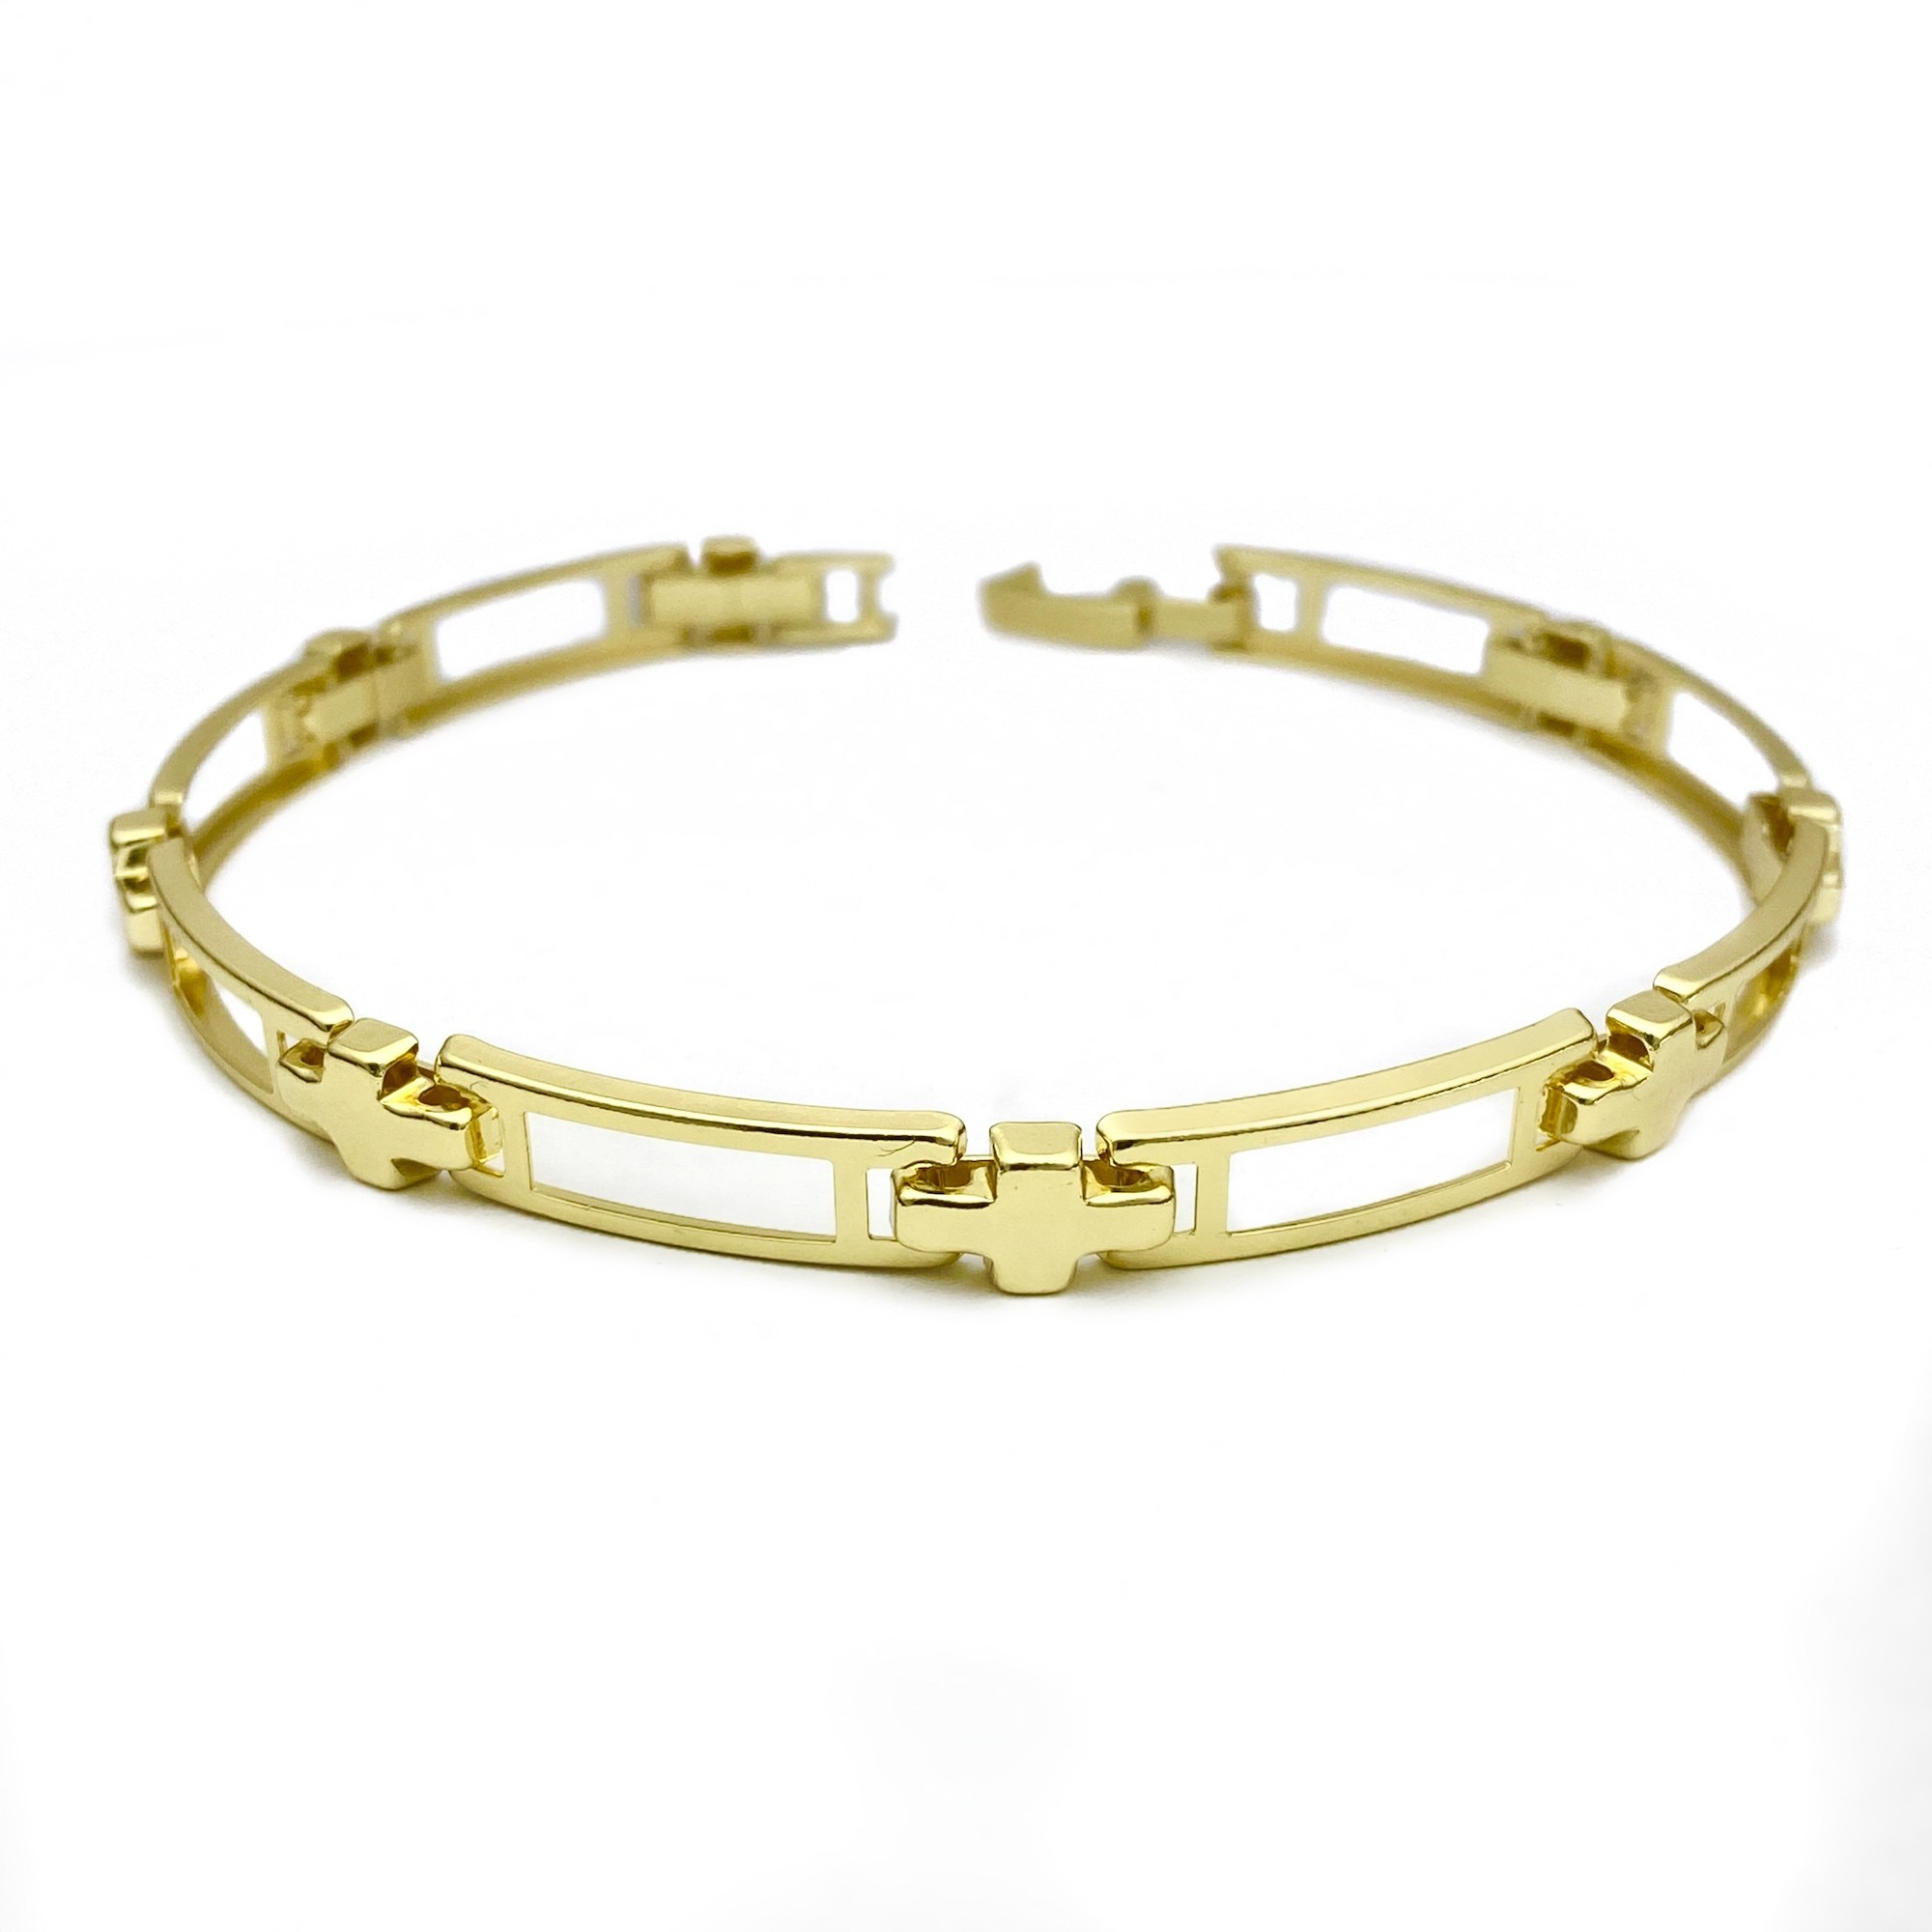 Bracelete Vazado 5mm (Banho Ouro 24k)